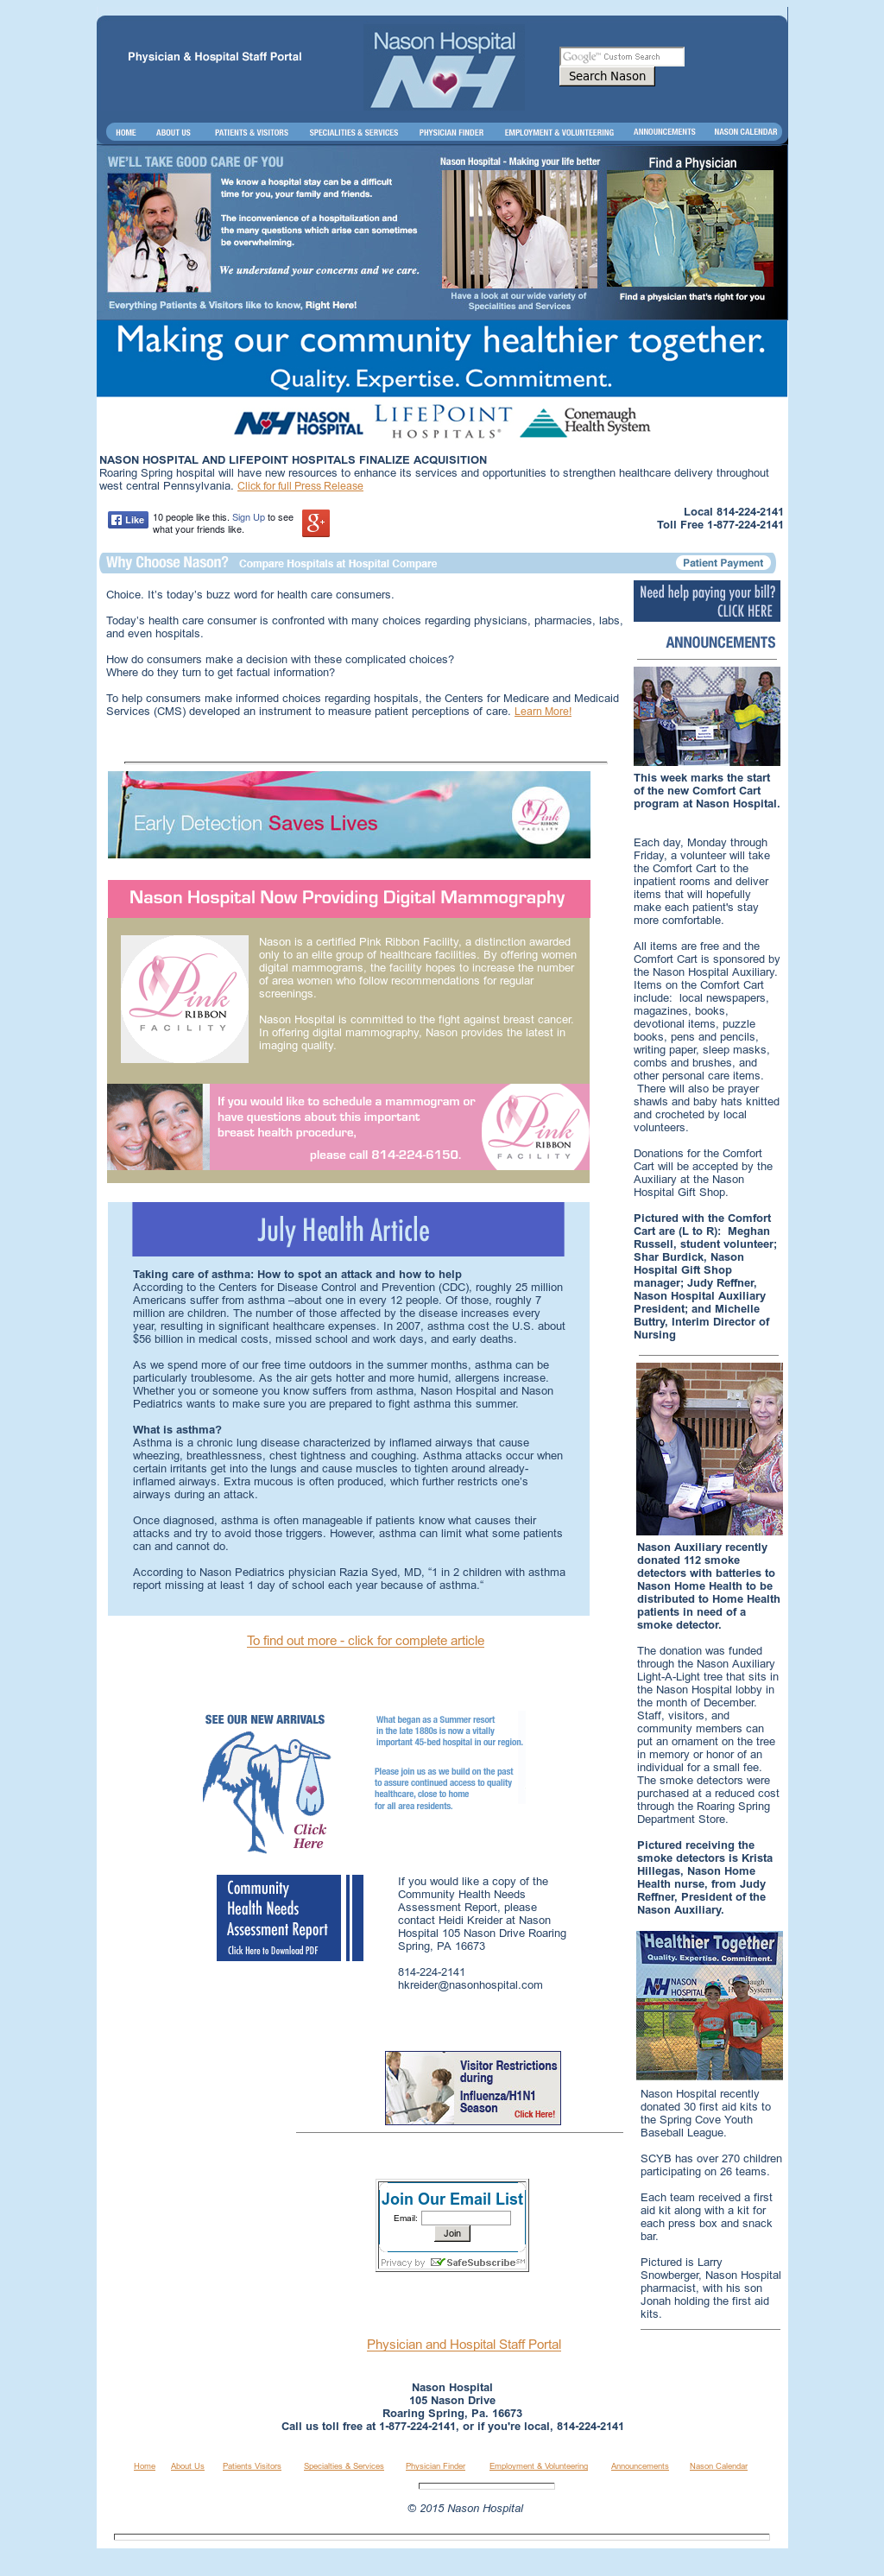 Nasonhospital Competitors, Revenue and Employees - Owler Company Profile